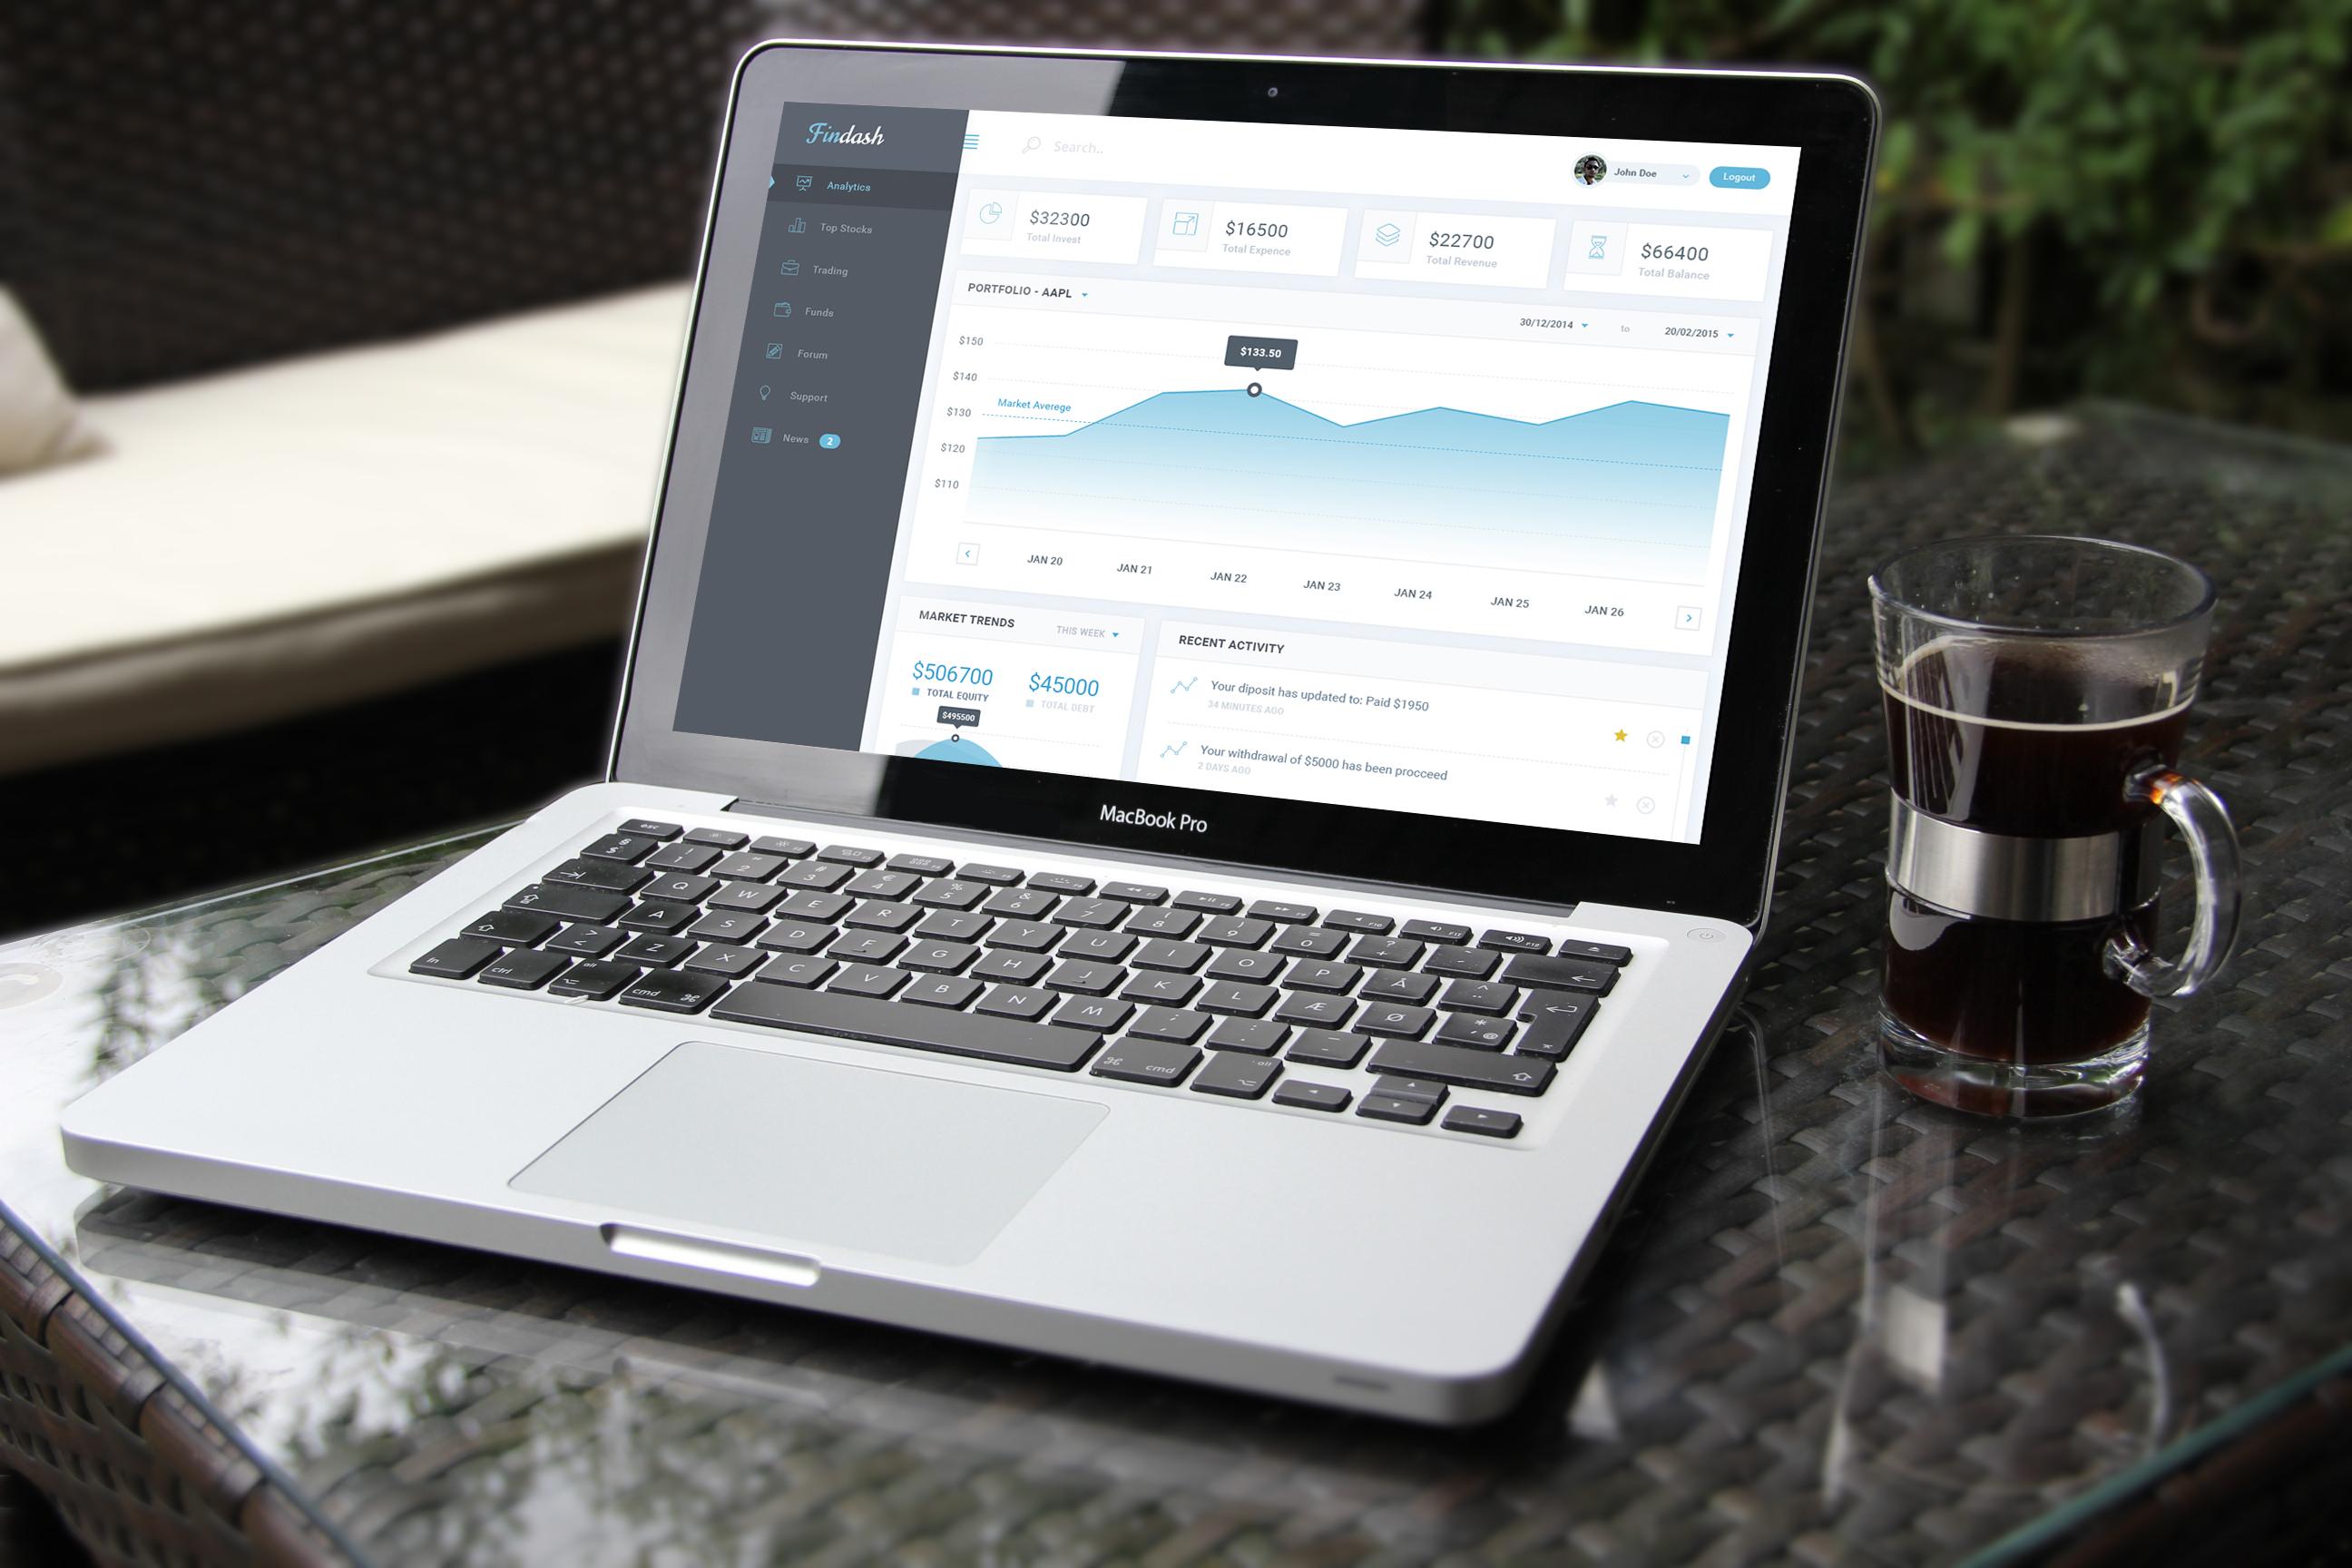 Macbook mockup recovered